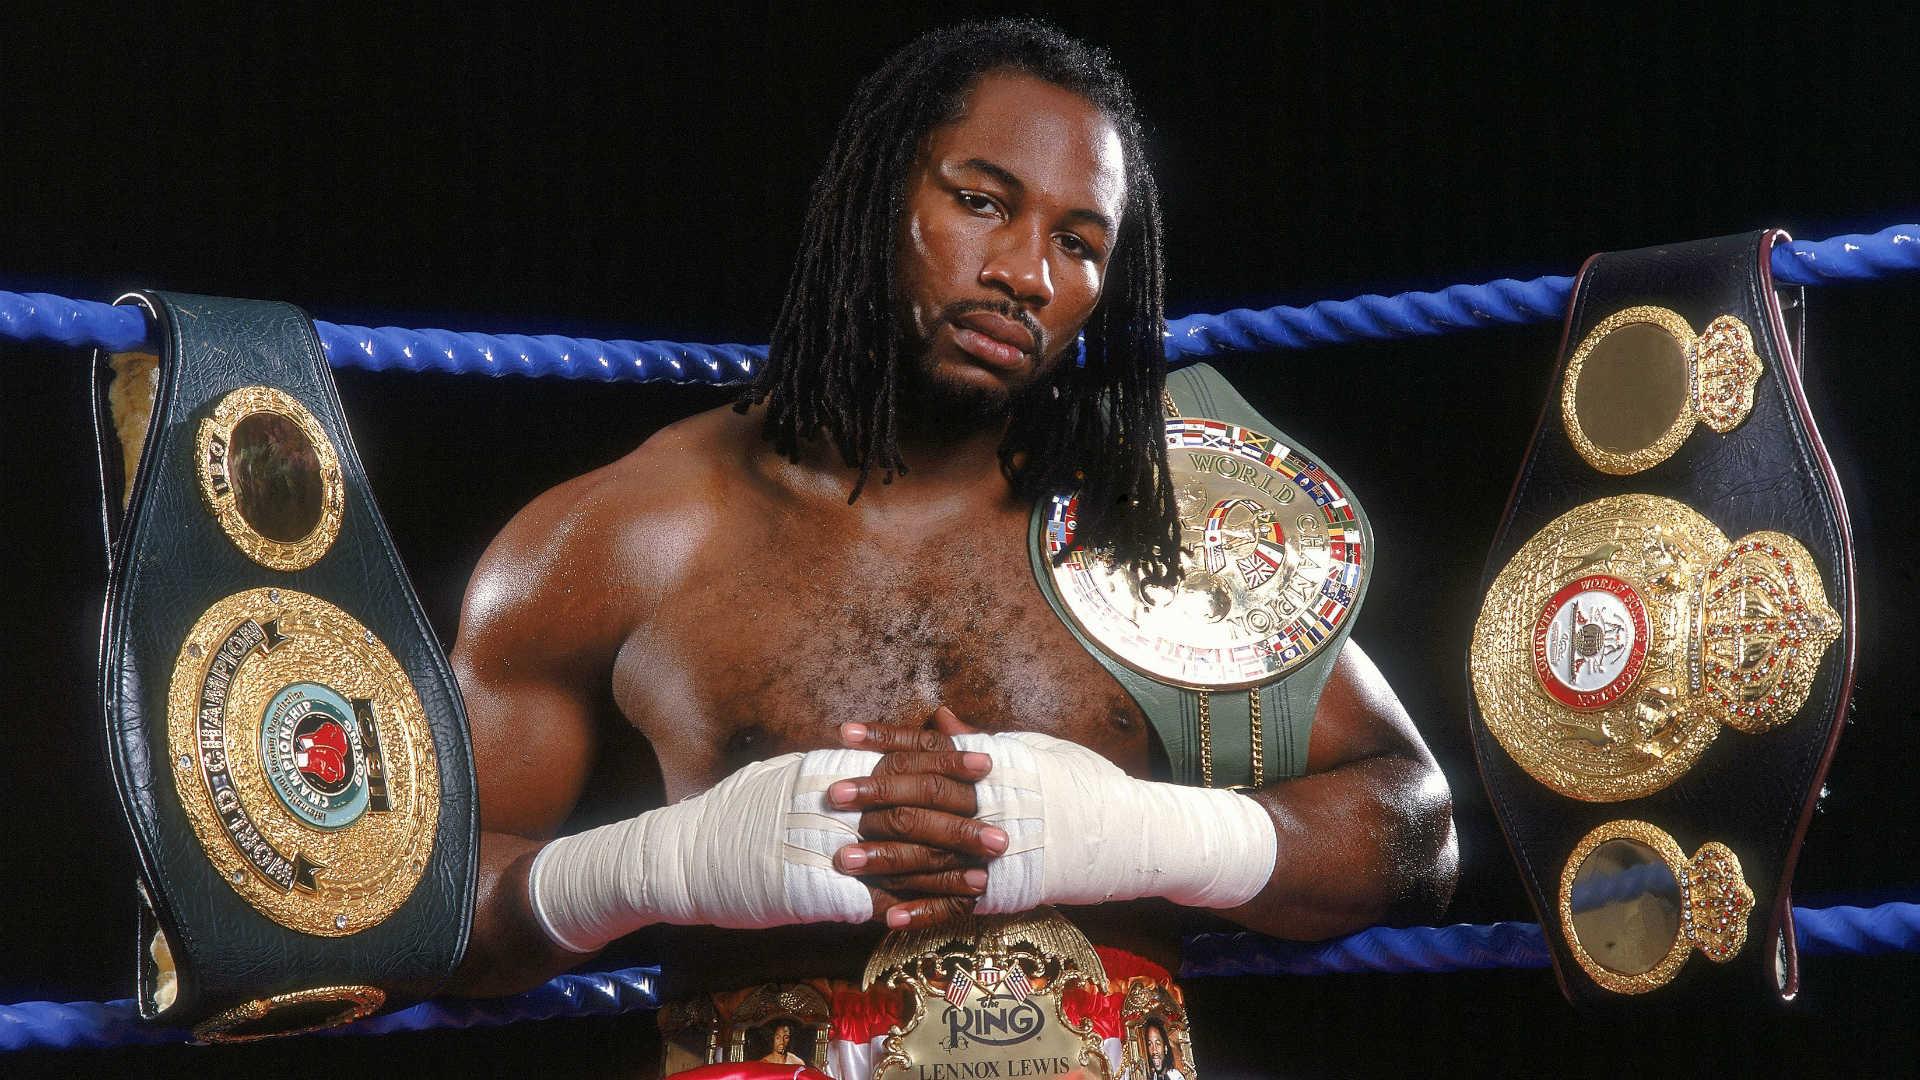 World Heavyweight Champion Lennox Lewis